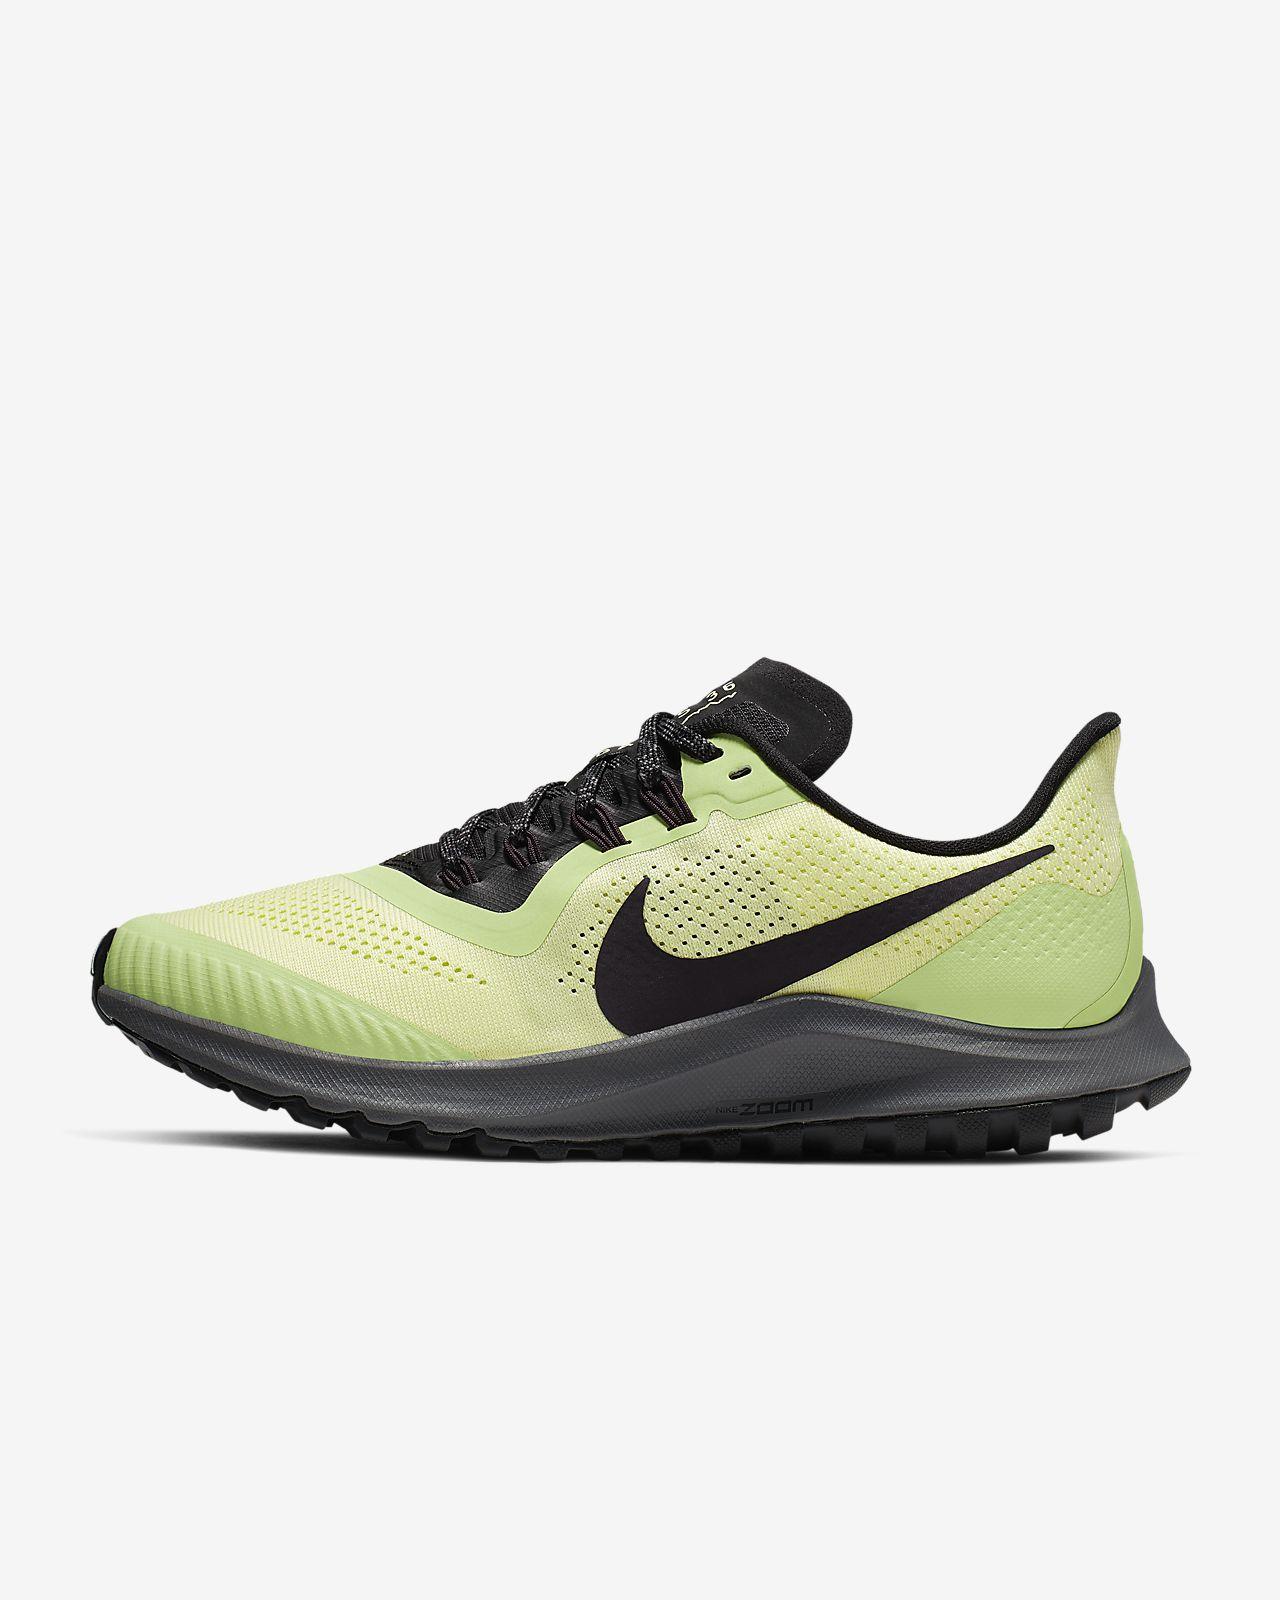 Женские беговые кроссовки Nike Air Zoom Pegasus 36 Trail